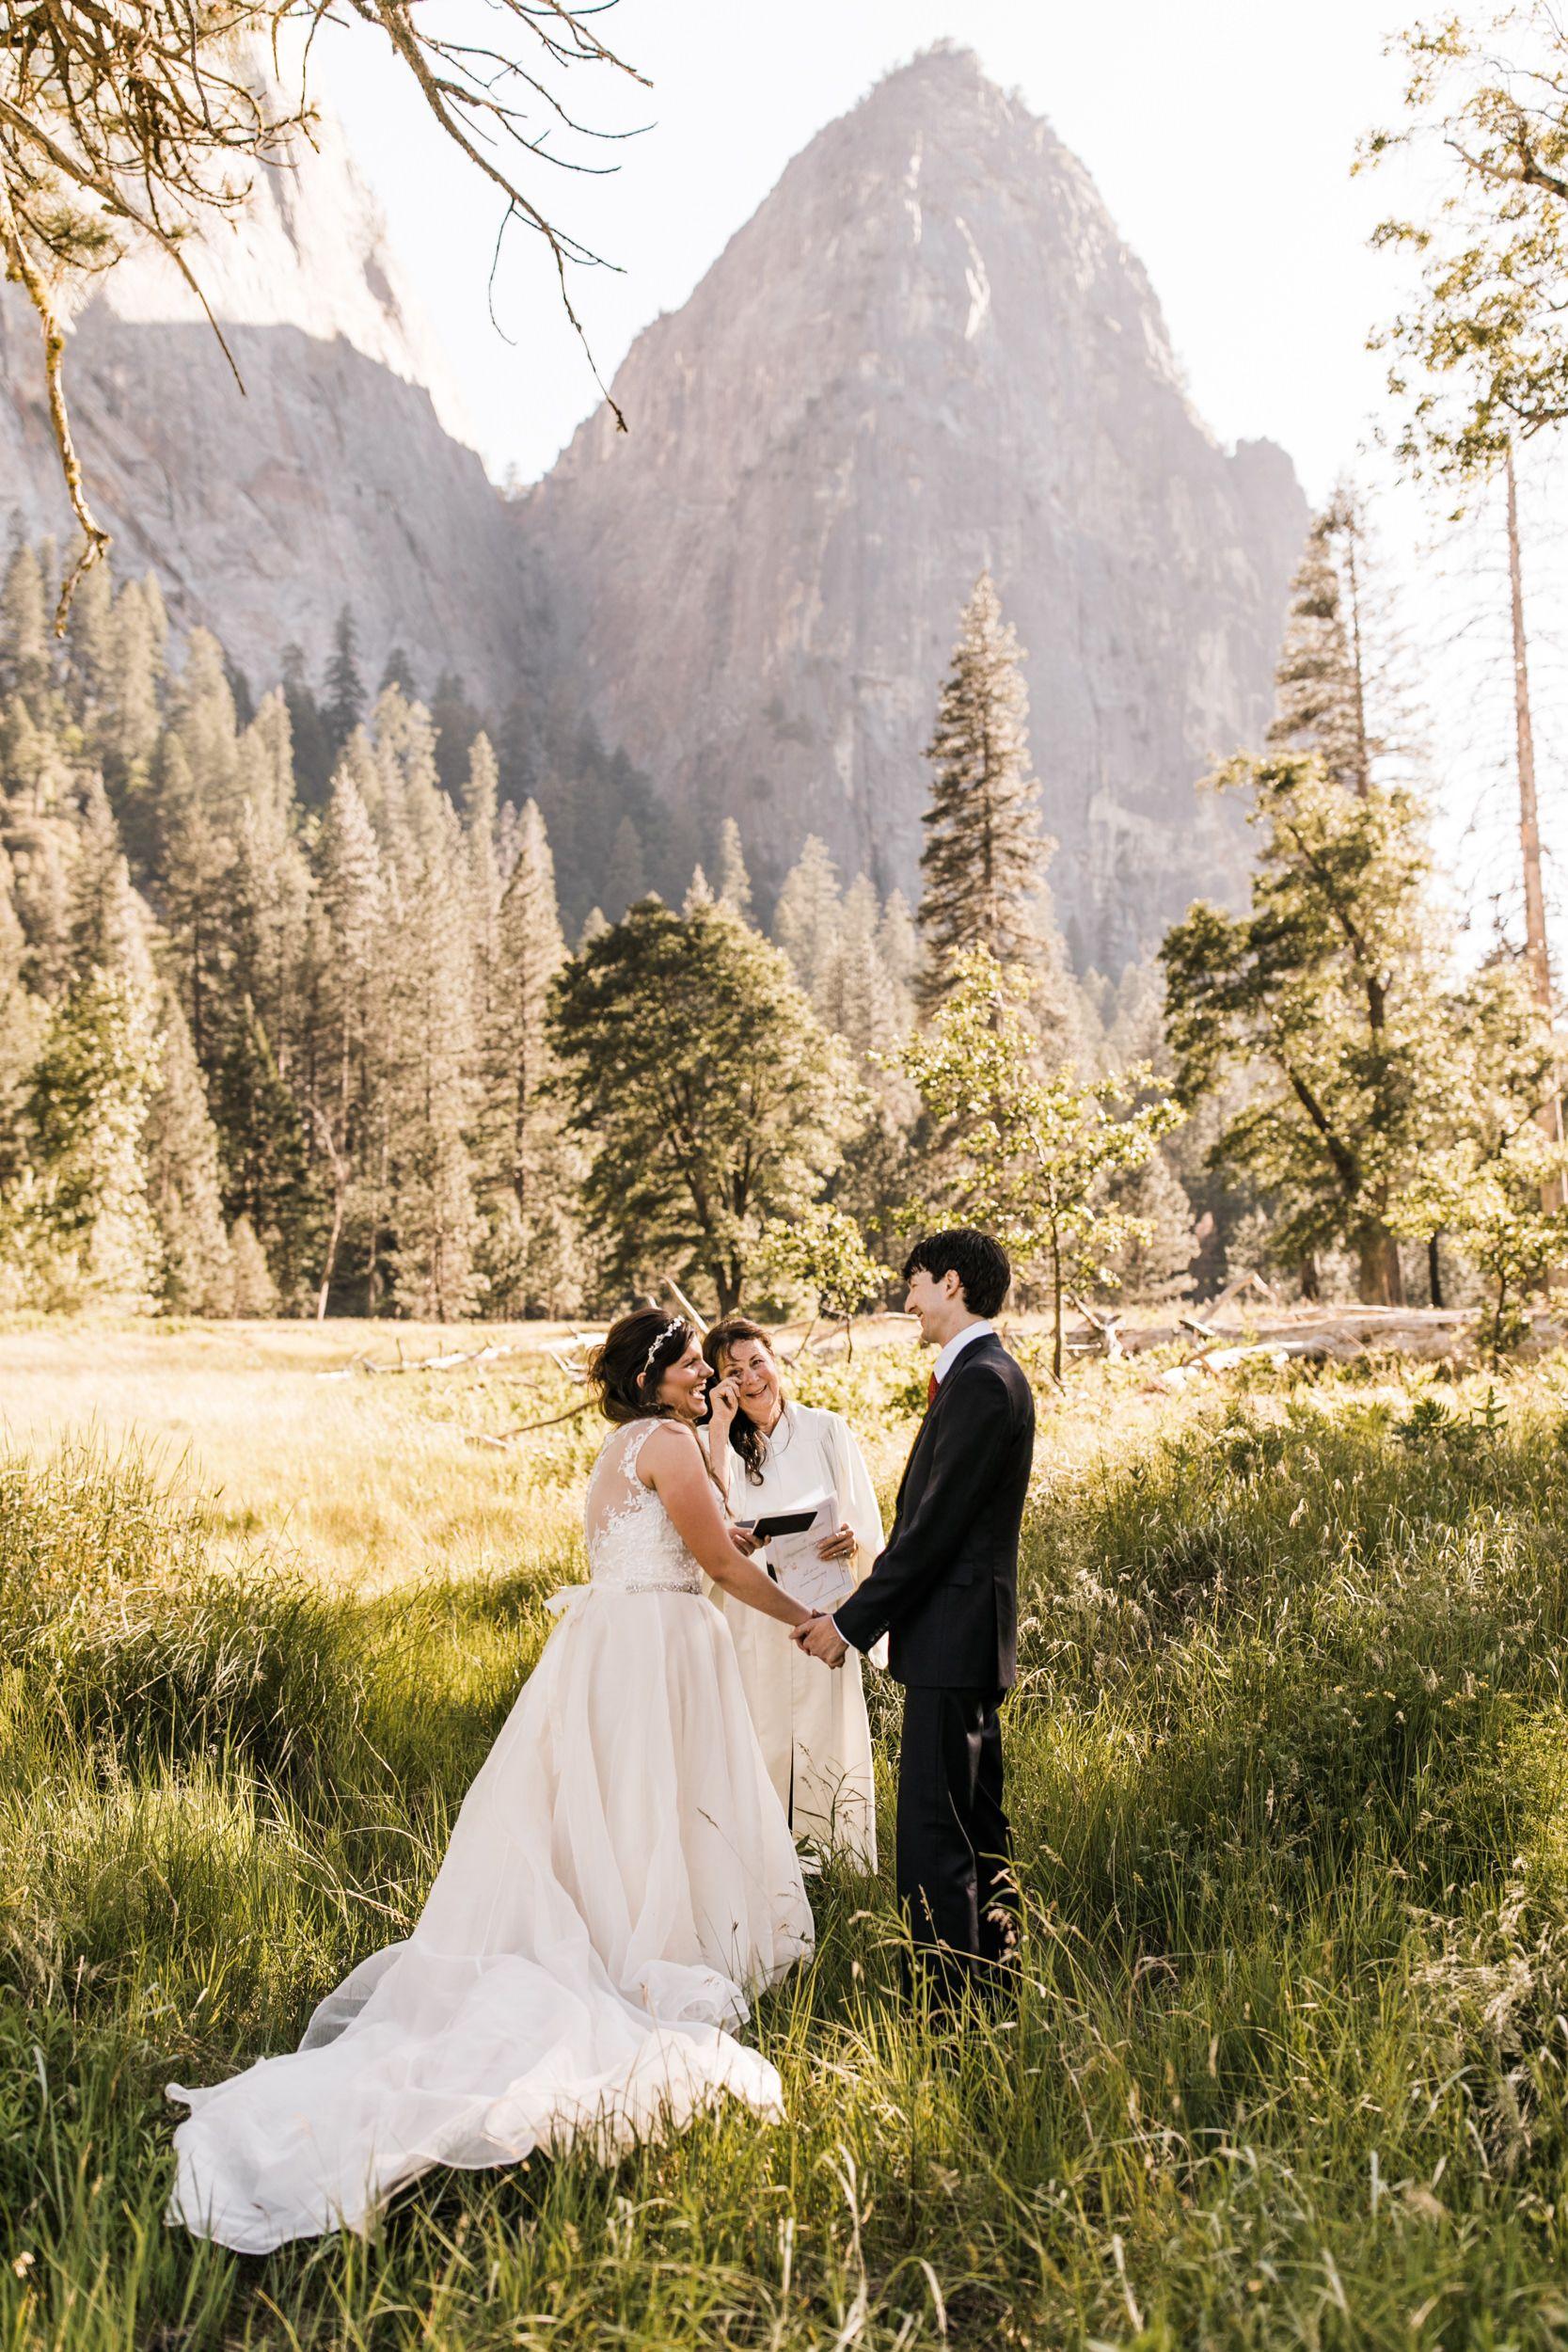 Yosemite National Park Adventure Elopement Yosemite Wedding Photographer Adventure Wedding Elopement Photographers In Moab Yosemite And Beyond The Hea Yosemite Wedding Adventure Wedding Yosemite Elopement